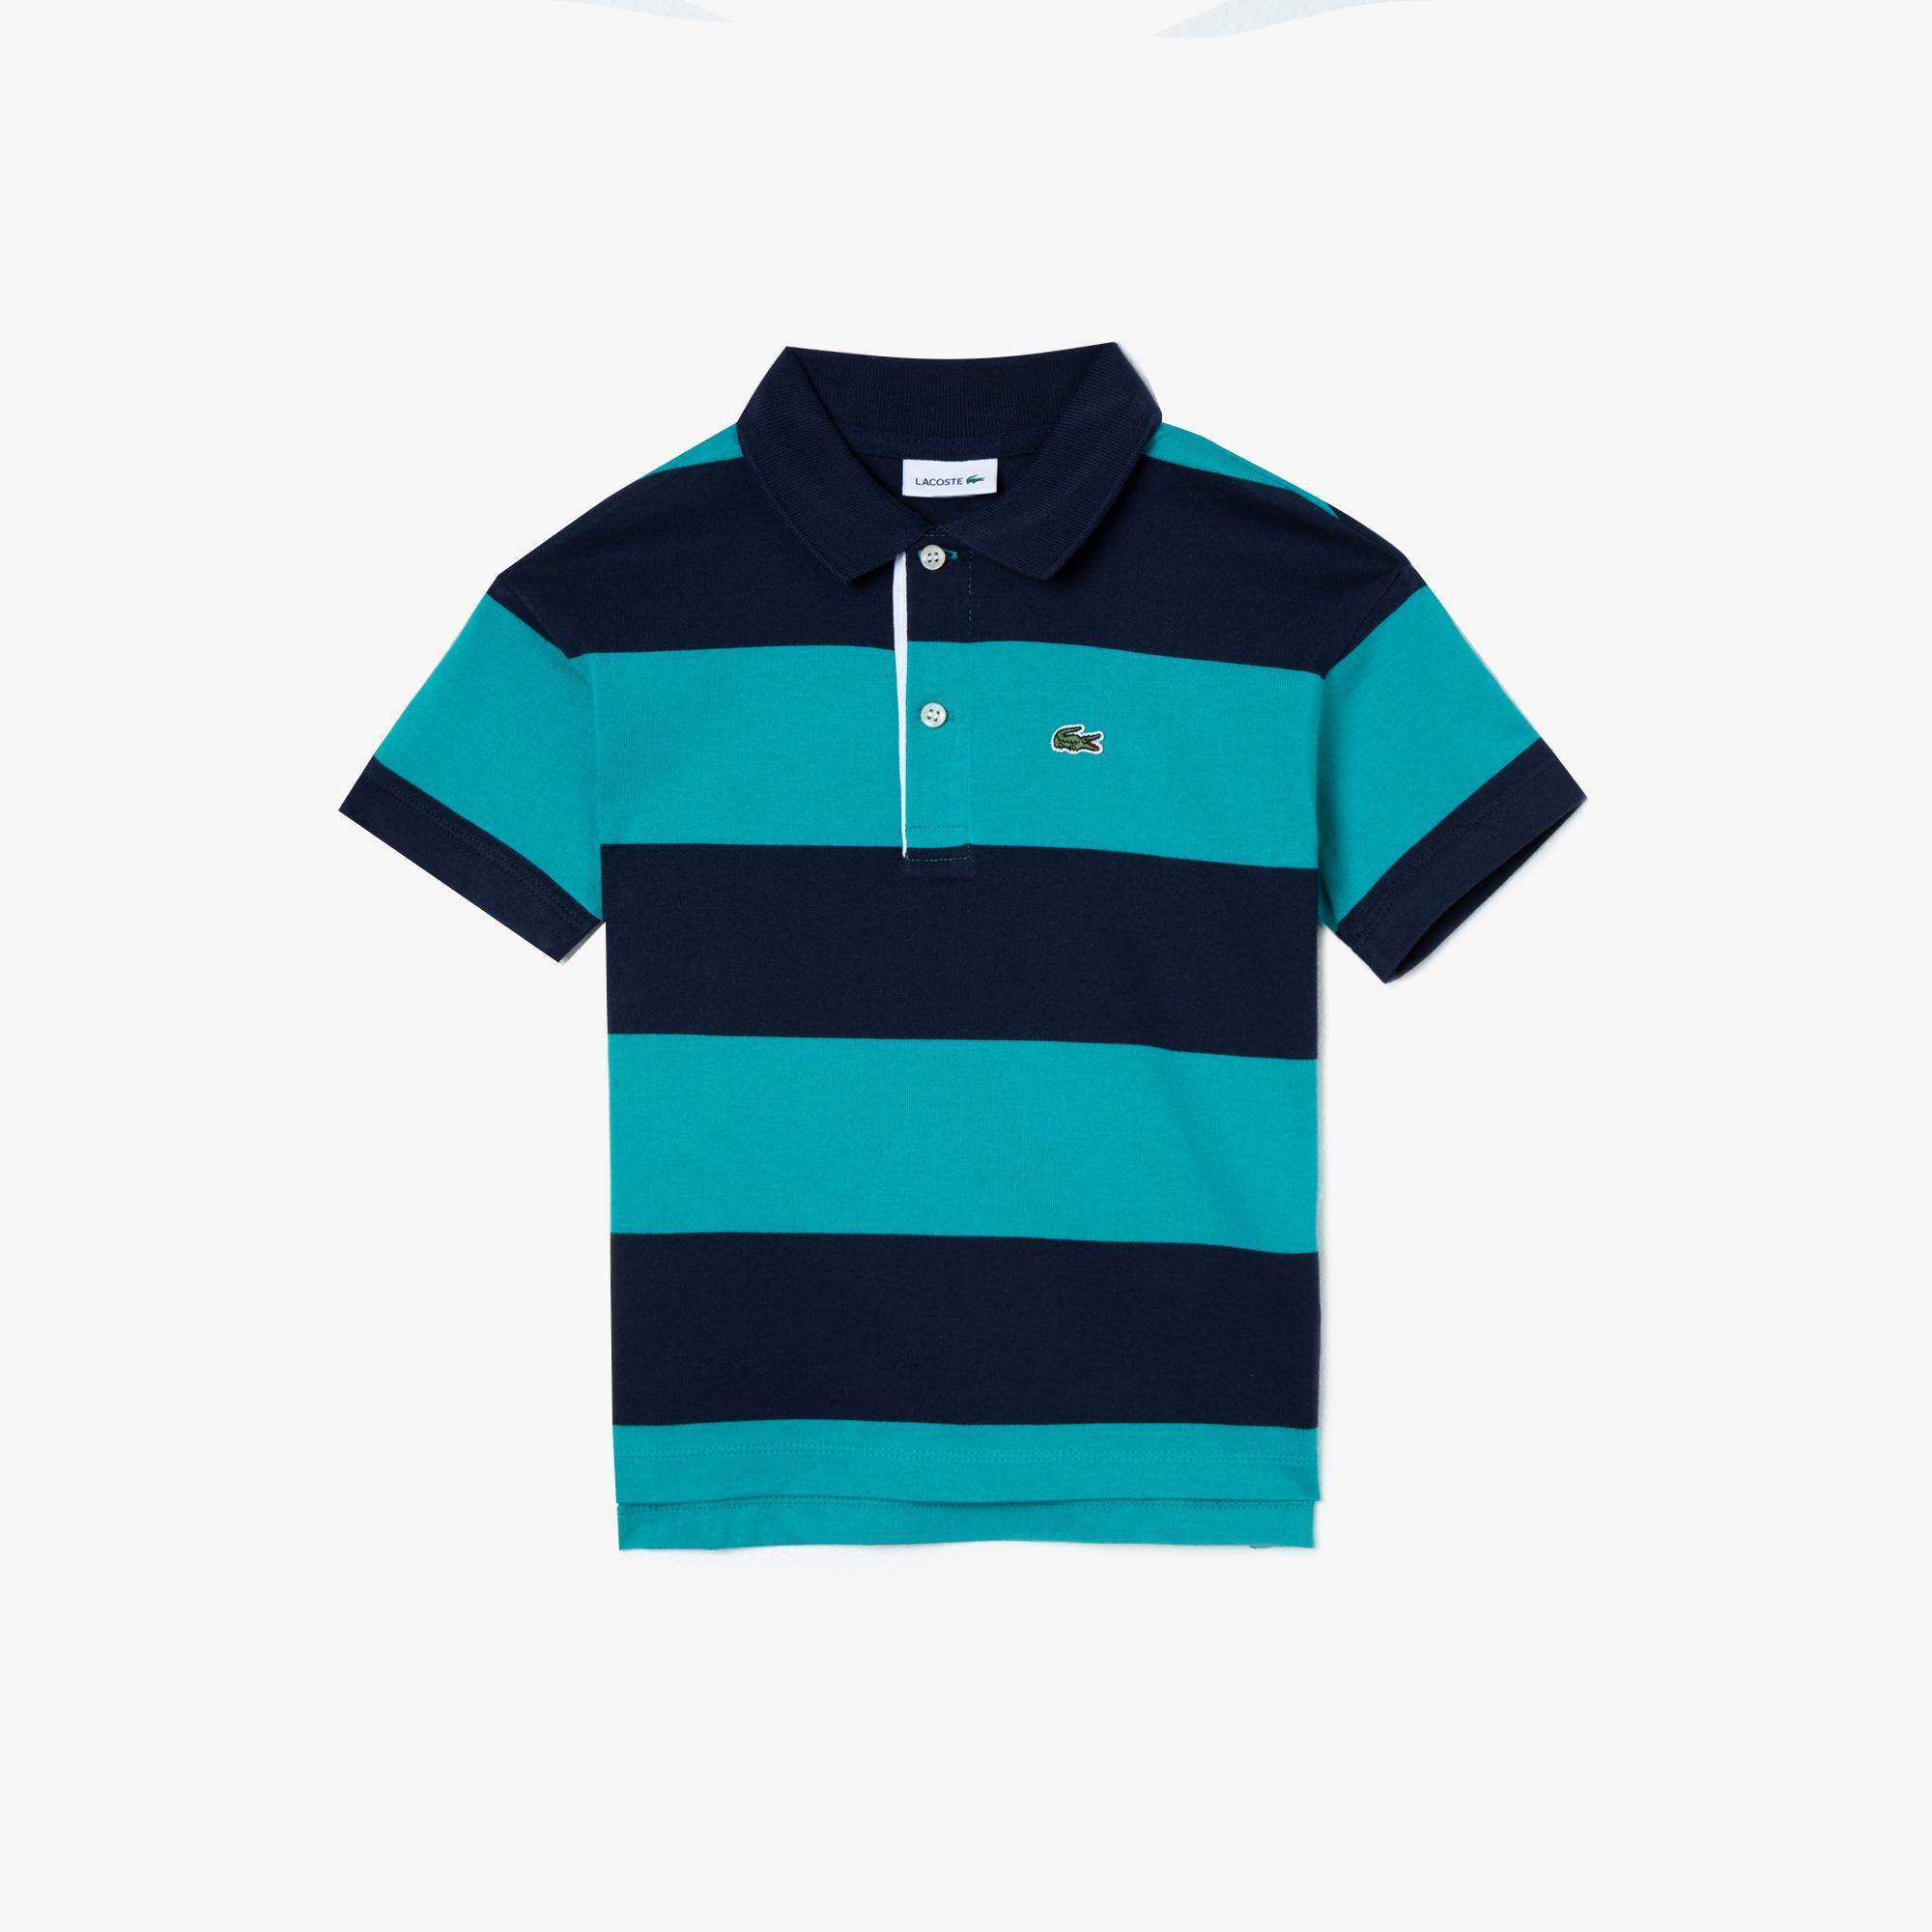 Lacoste Çocuk Çizgili Blok Desenli Lacivert - Mavi Polo